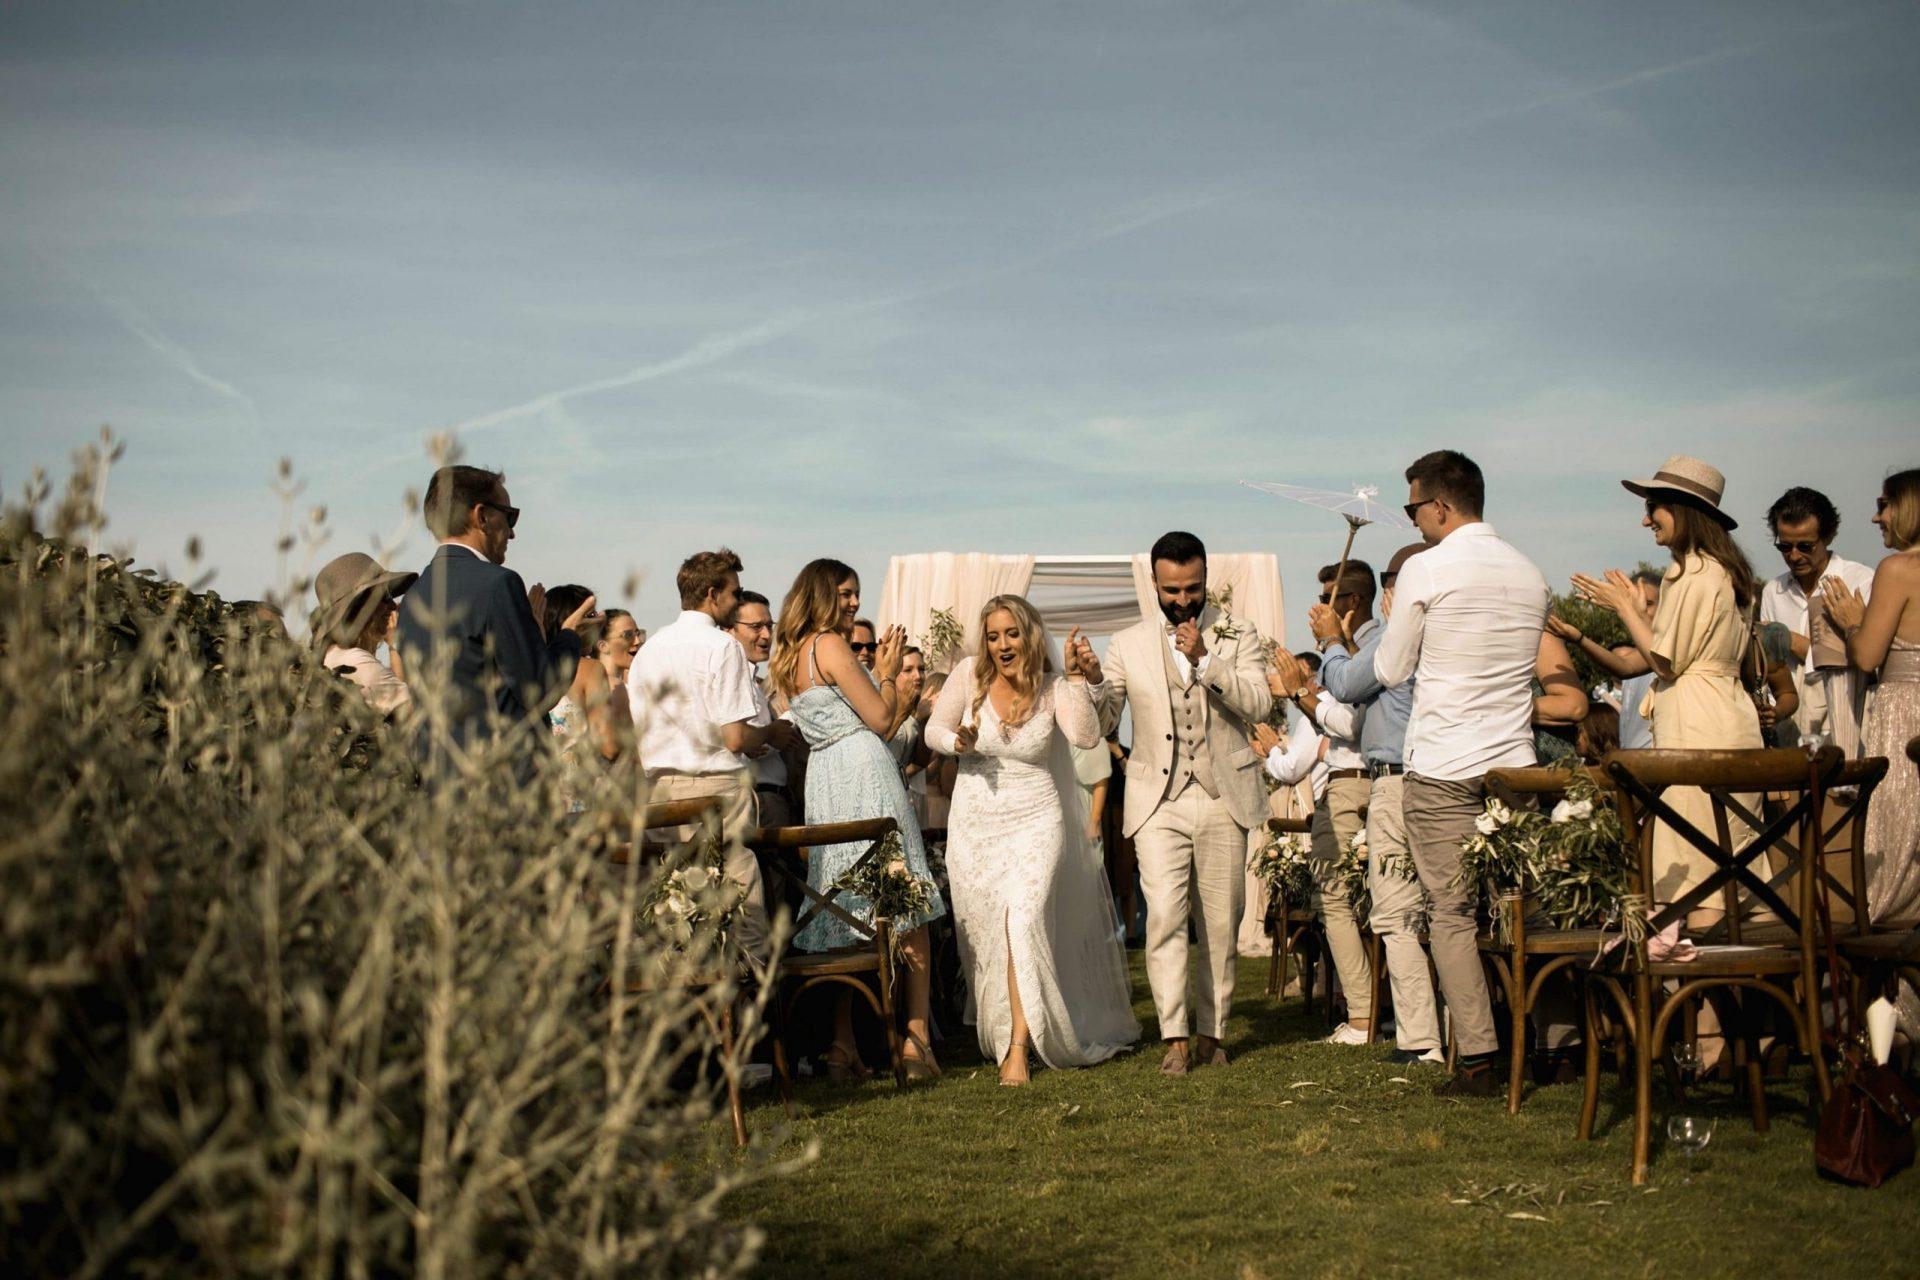 Melanie & Perit, bucolic and sophisticated wedding ceremony